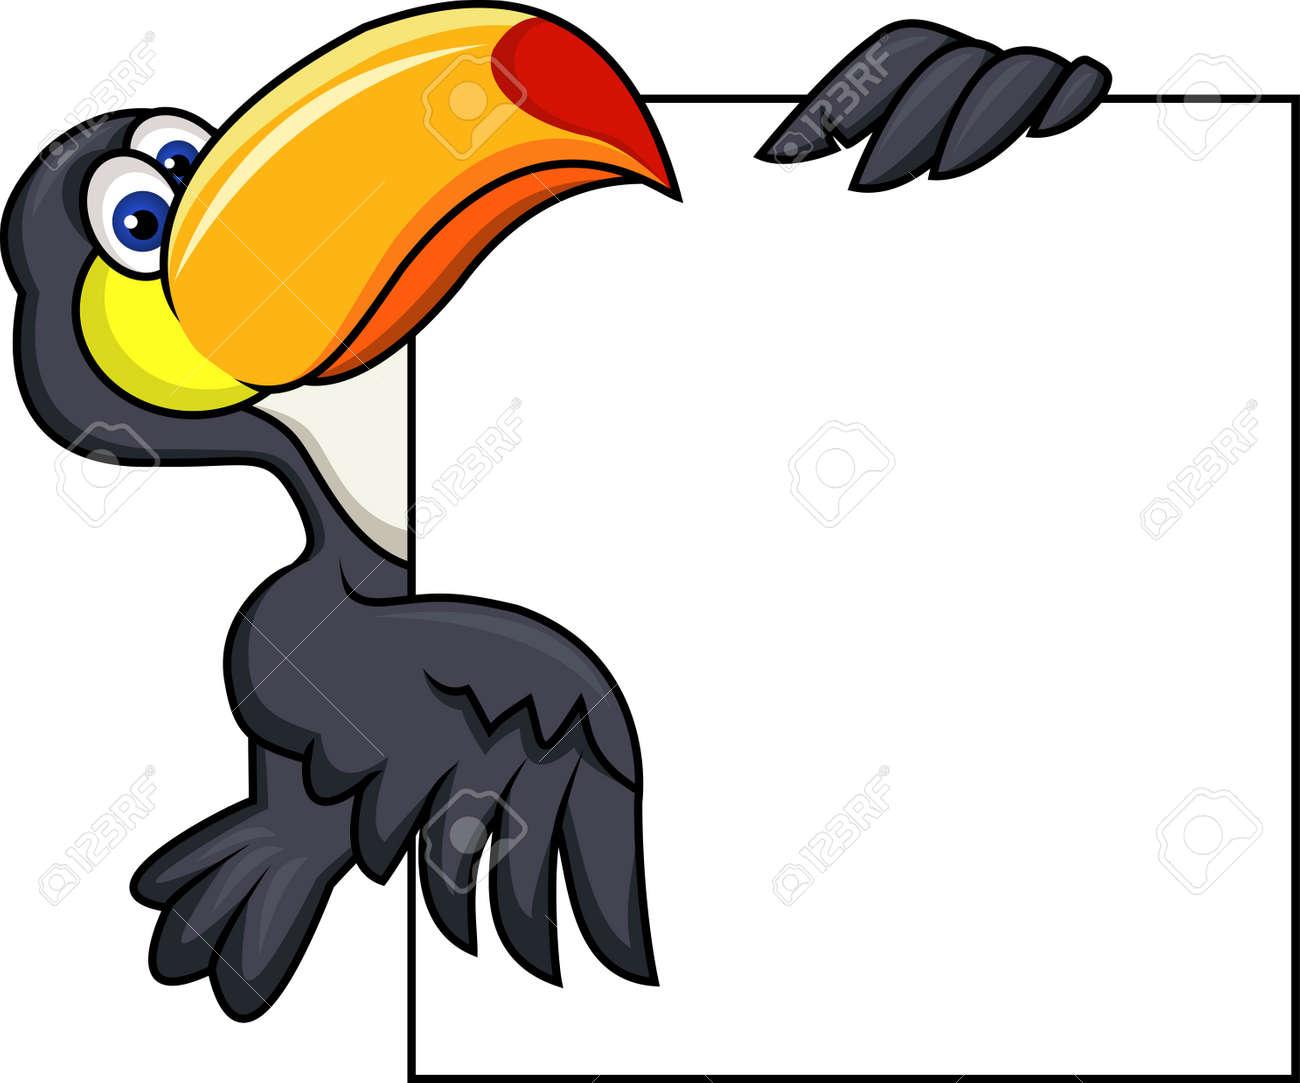 Toucan bird with blank sign Stock Vector - 13780098